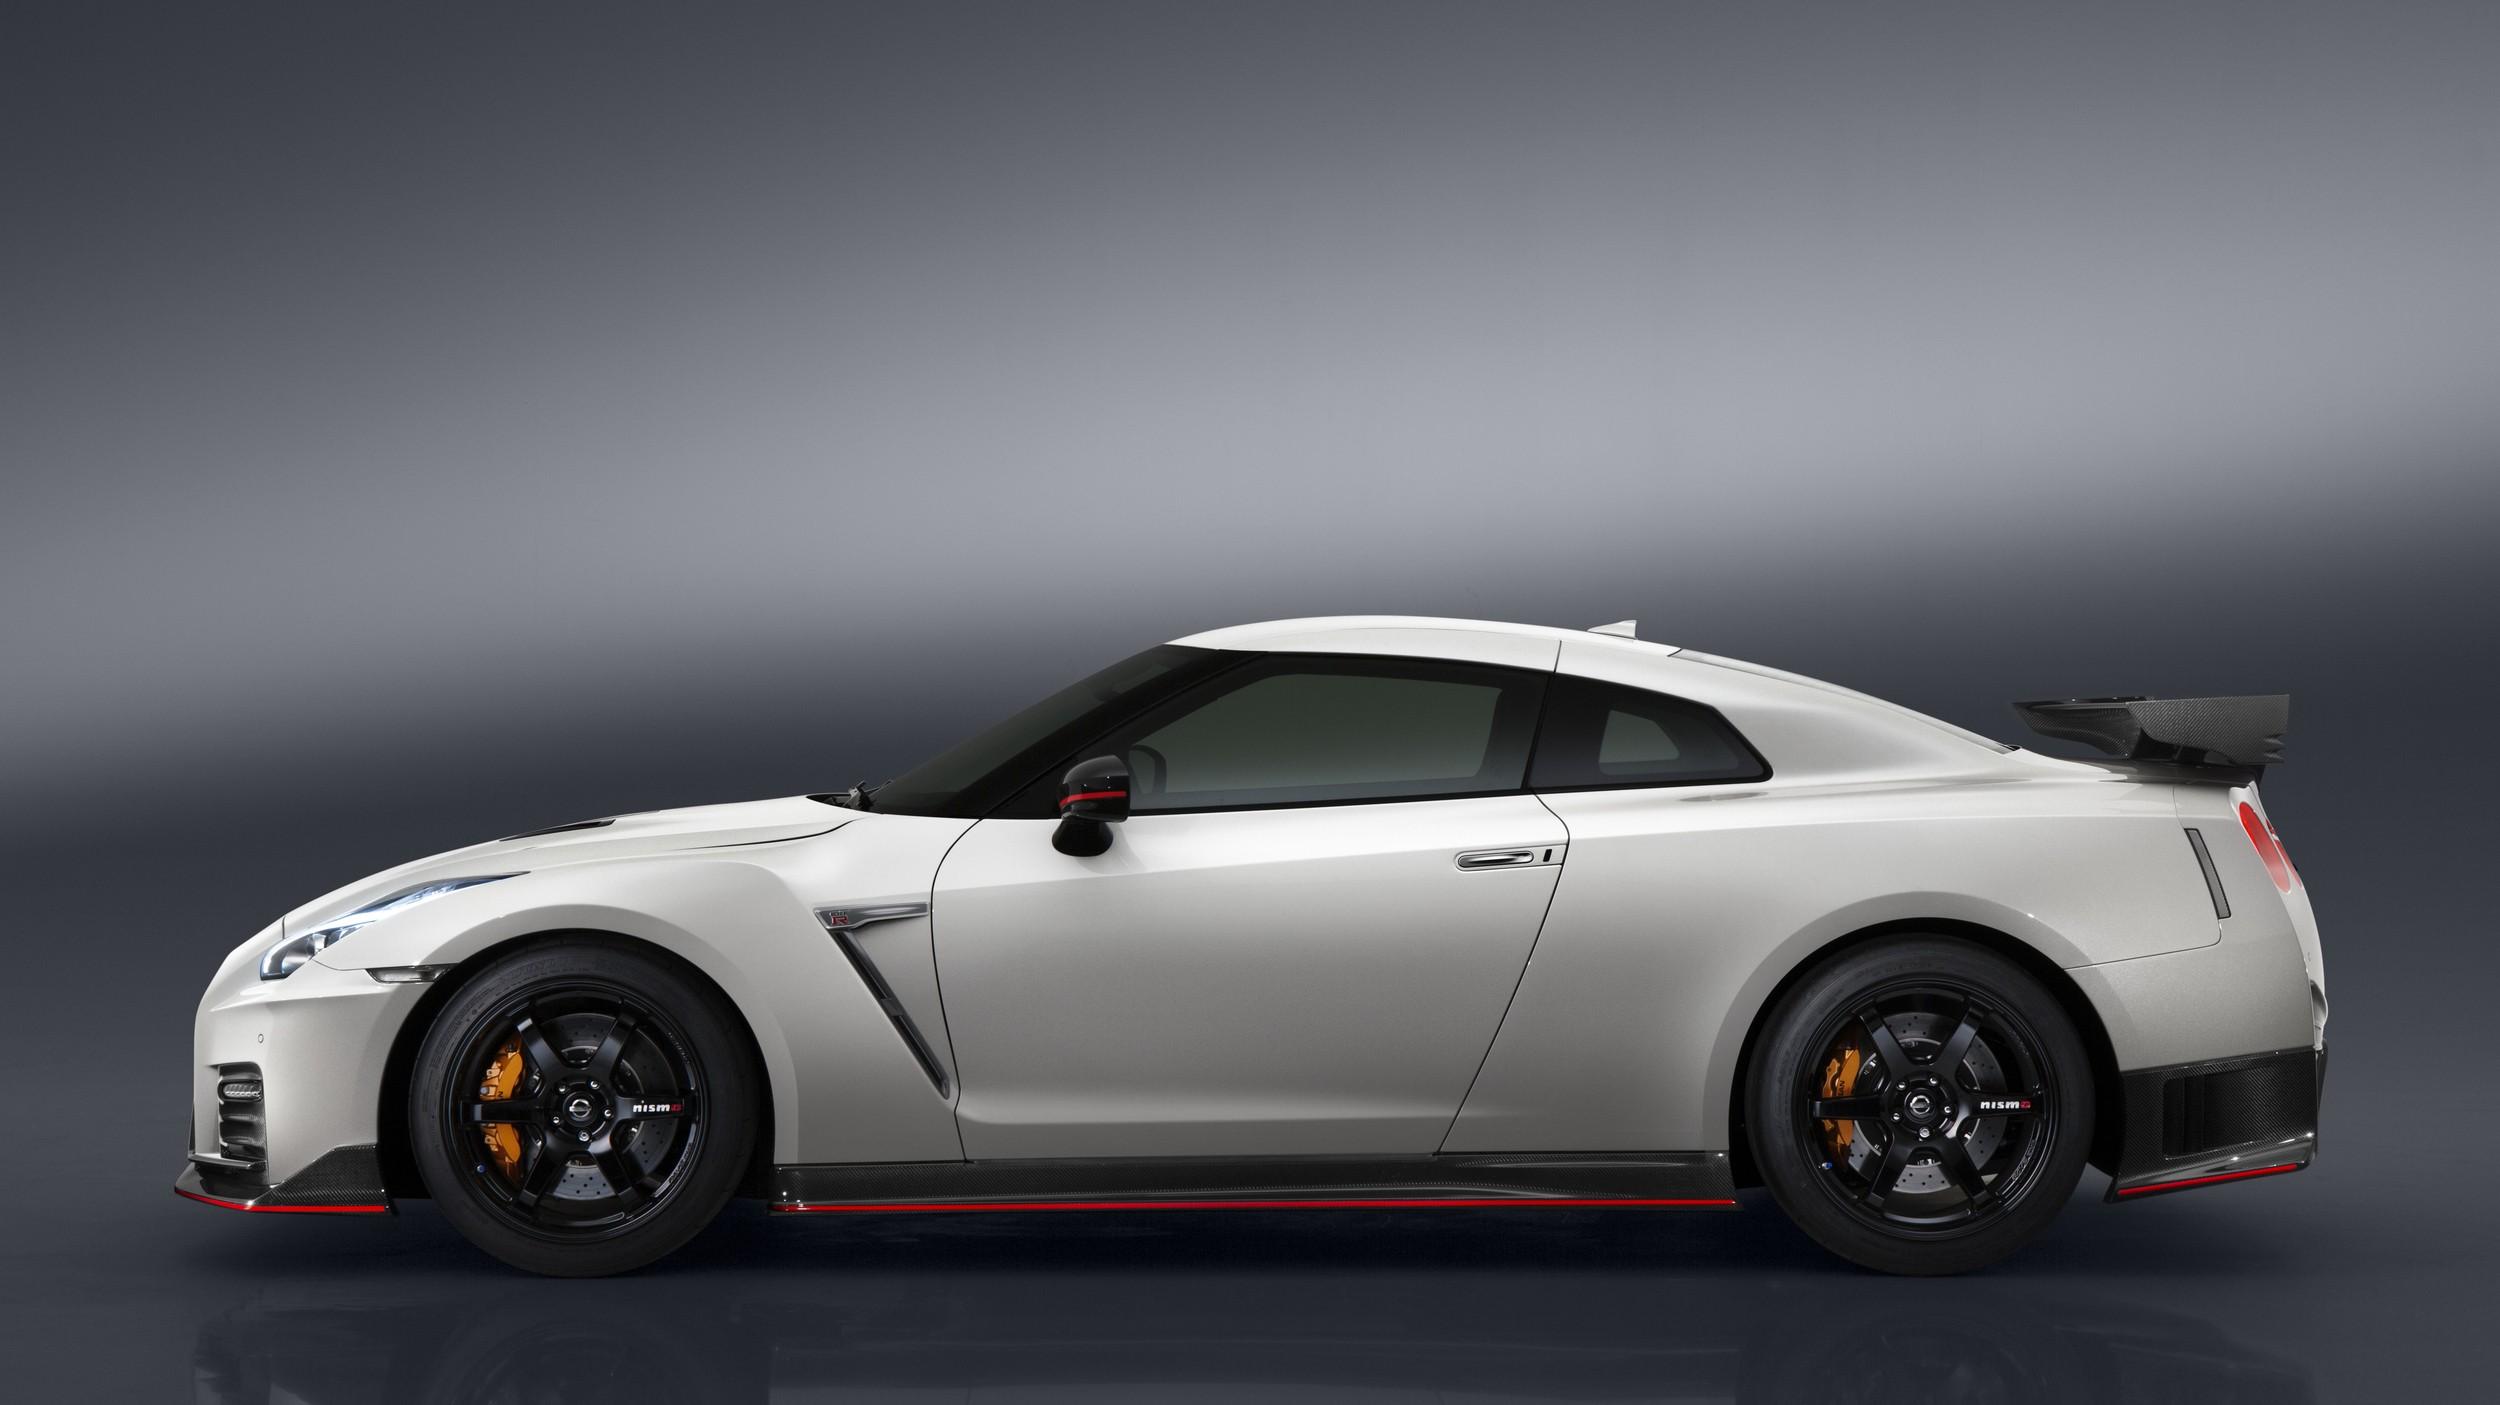 Rear Engined Nissan Gt R Rendered As Porsche Trolling Godzilla